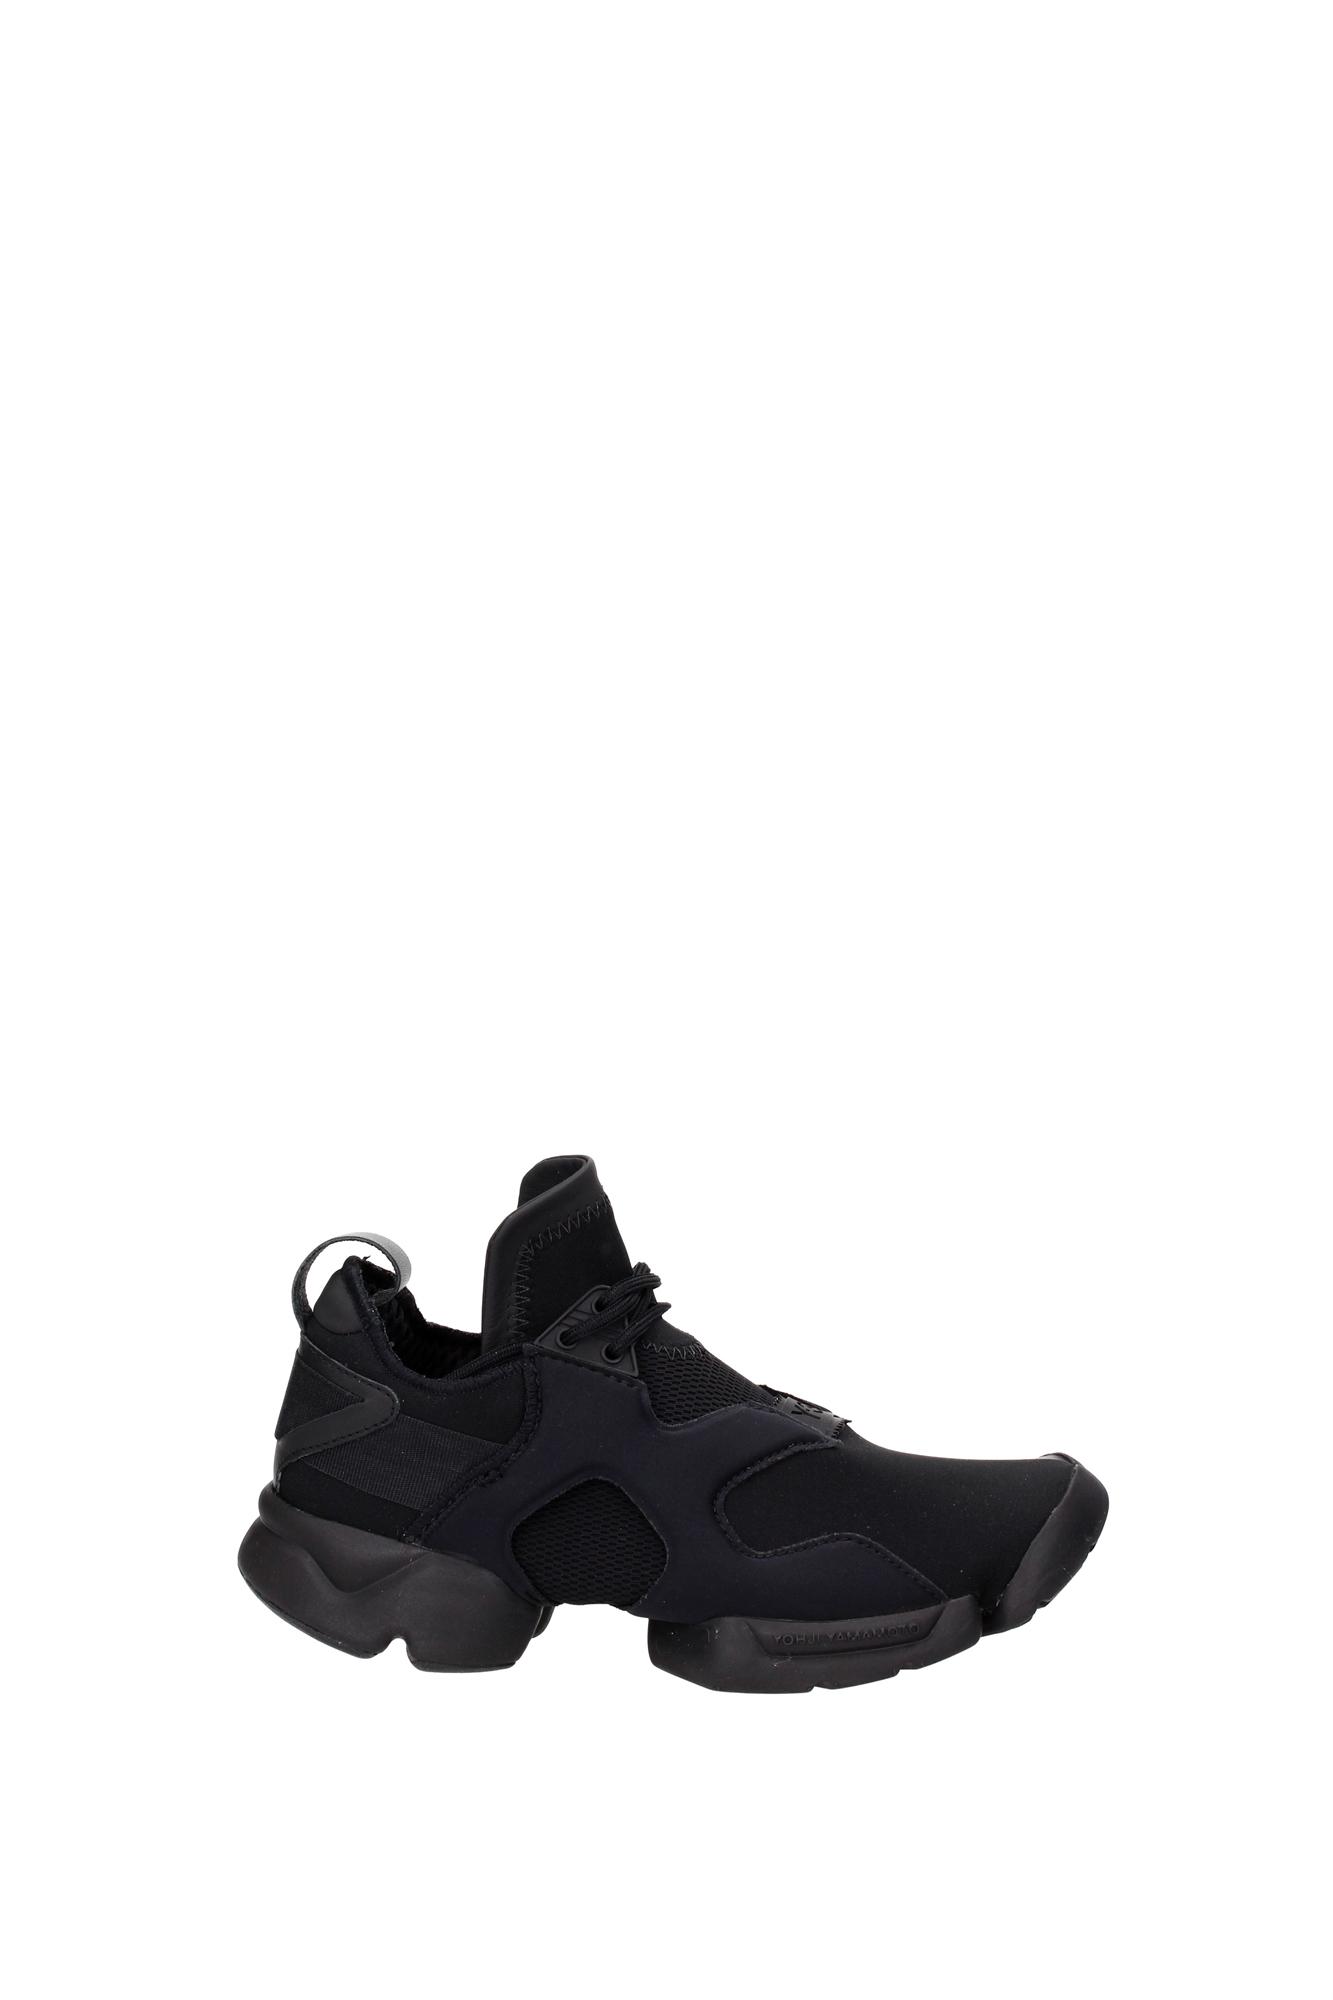 Nike Mujer Air Max 90 Ultra 2.0 Flyknit corriendo Negro Blanco corriendo Flyknit Zapatos 881109-002 8b6b9b